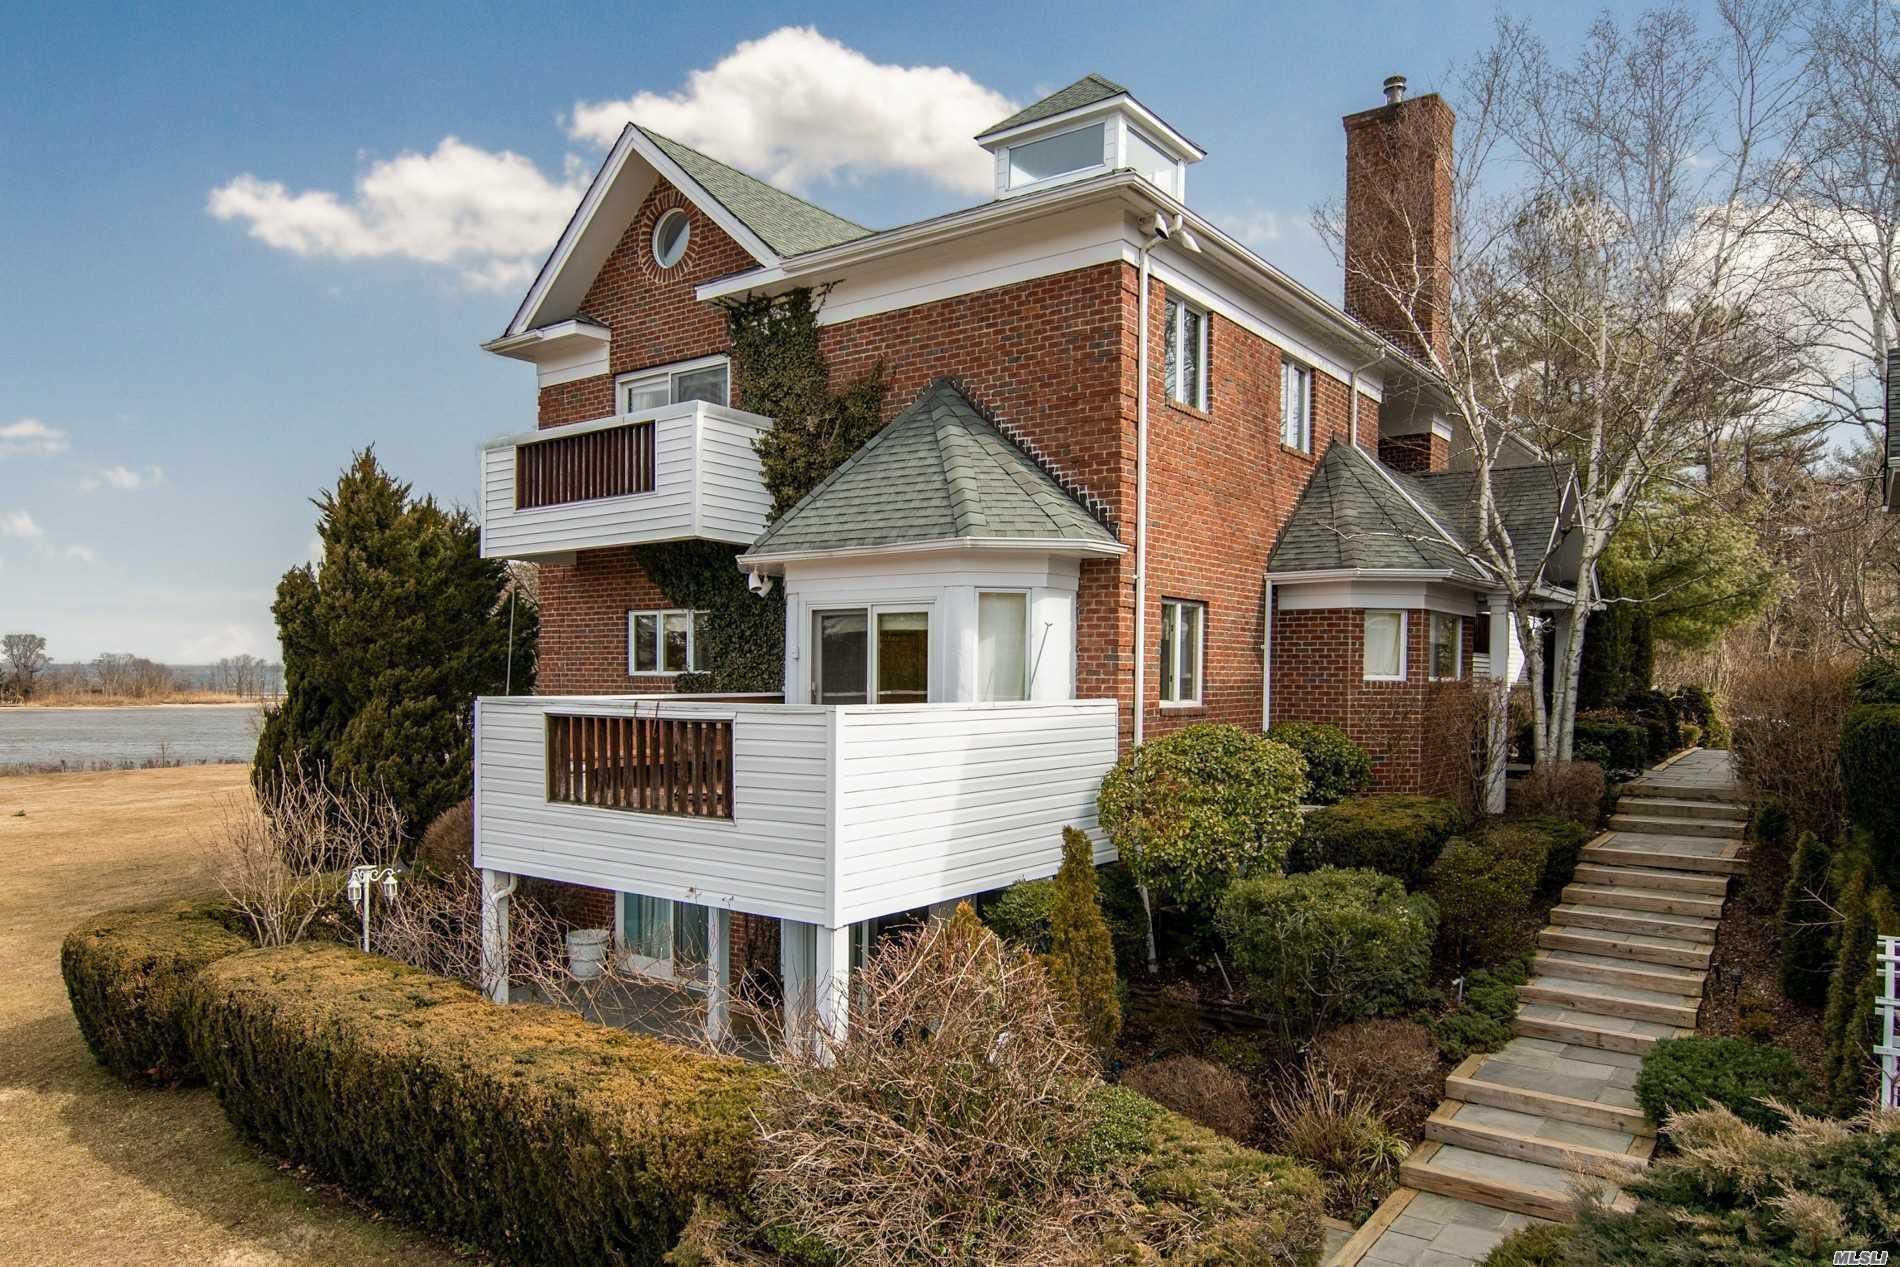 Property for sale at 3 High Ridge Court, Glen Cove NY 11542, Glen Cove,  New York 11542